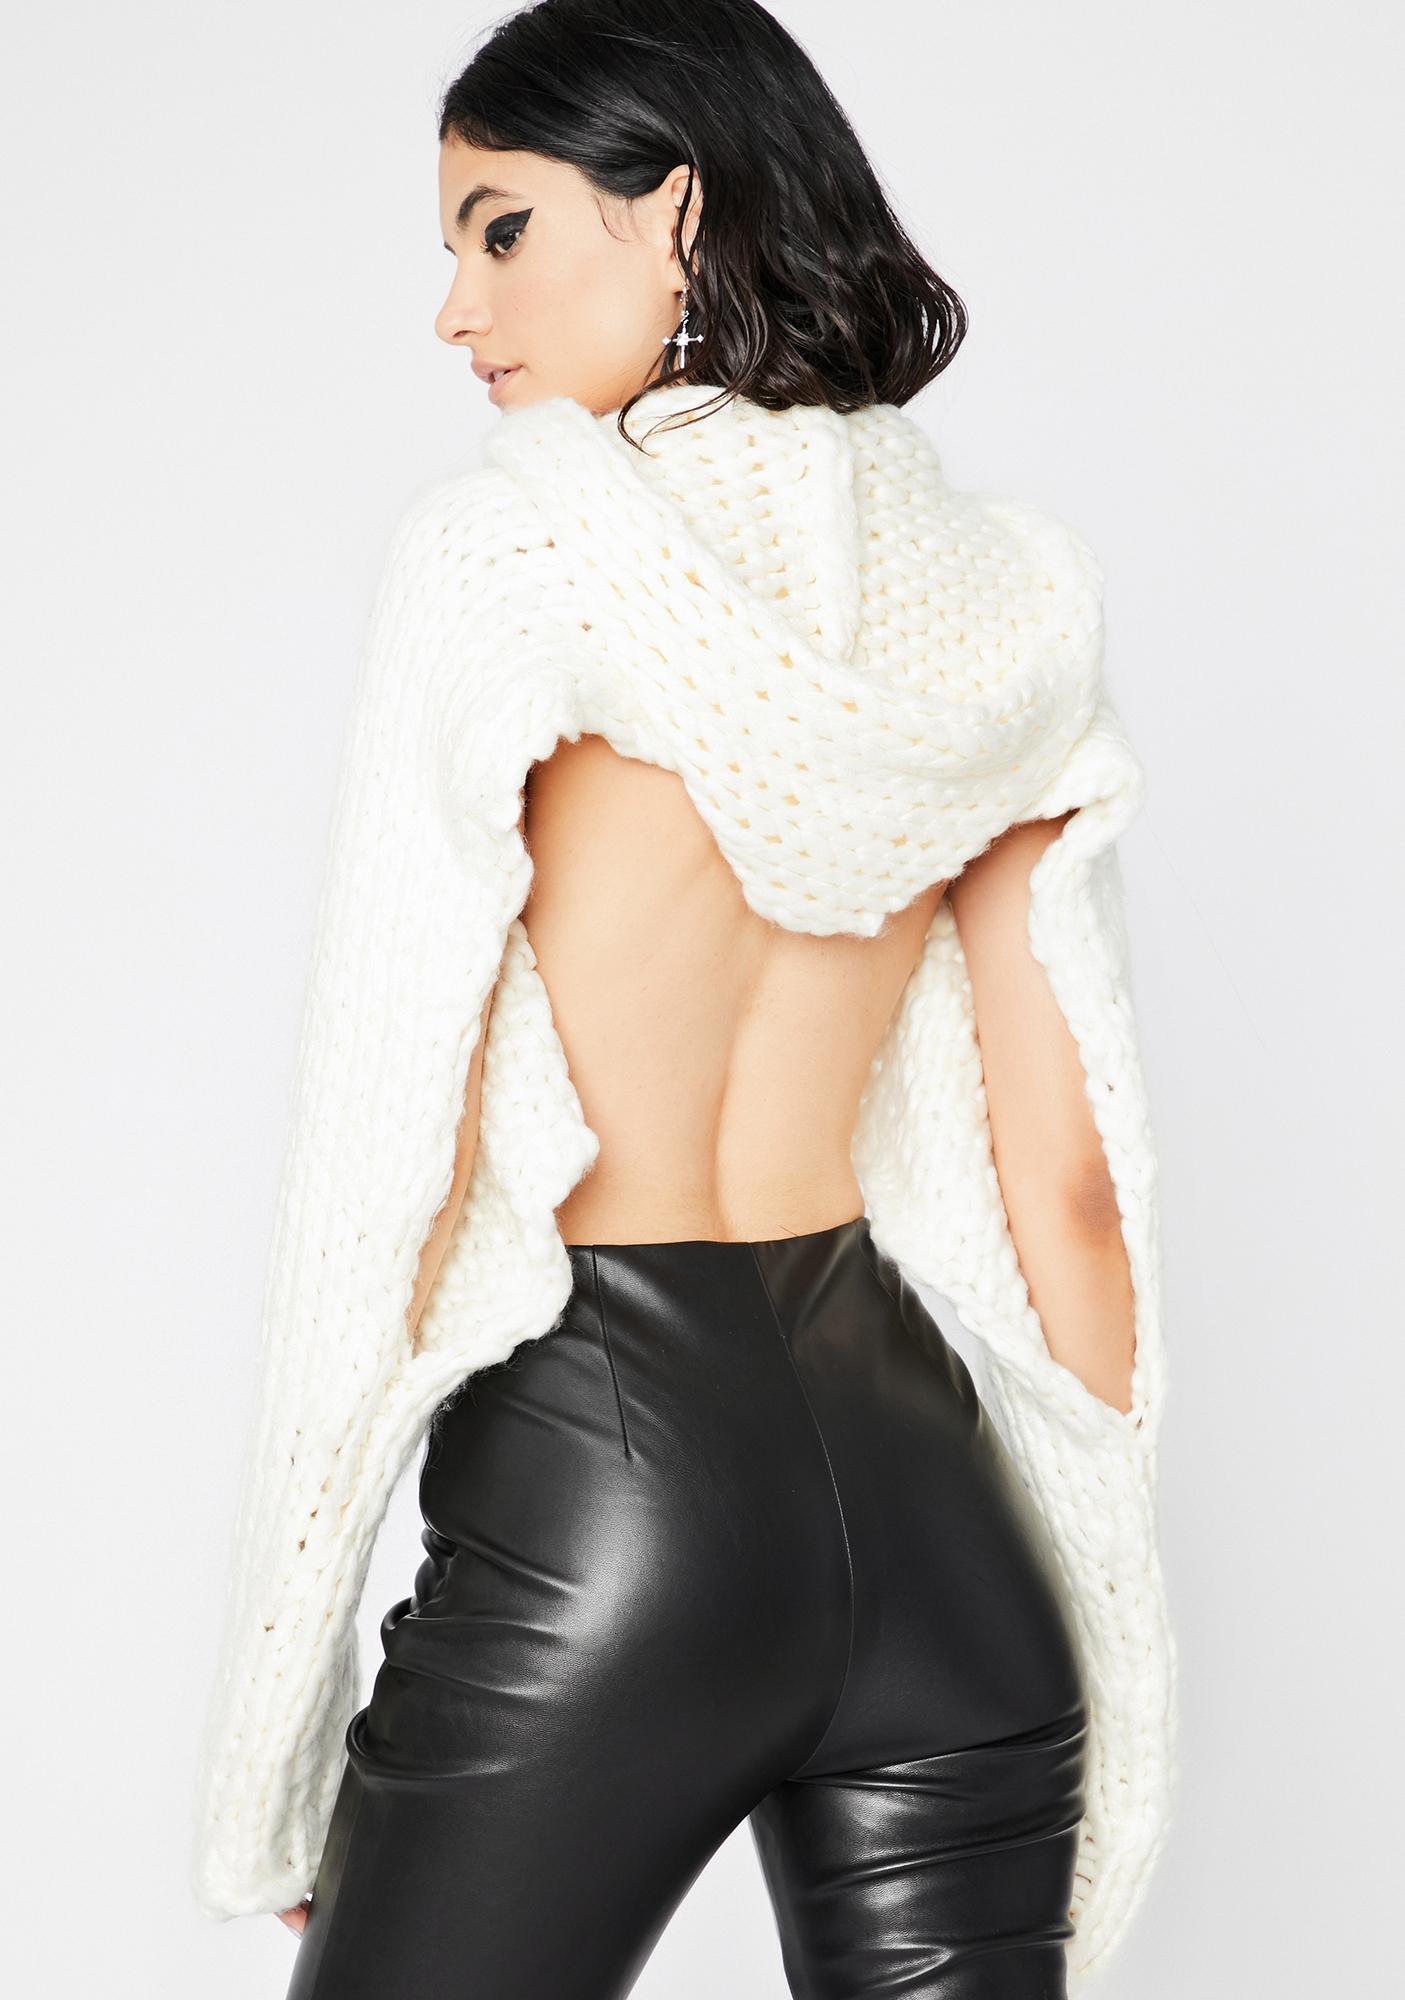 Pure Chic Freak Sweater Shrug